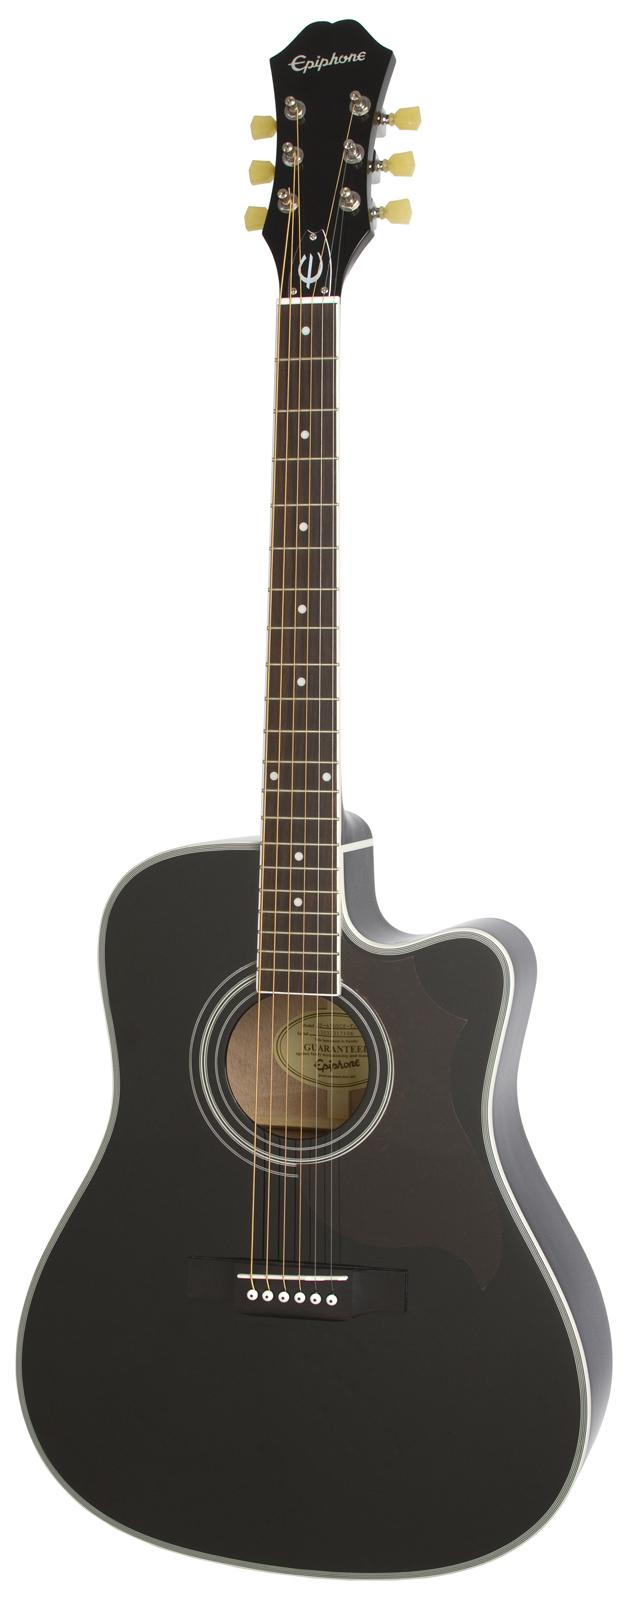 epiphone ft 350sce ebony guitares electro acoustiques. Black Bedroom Furniture Sets. Home Design Ideas